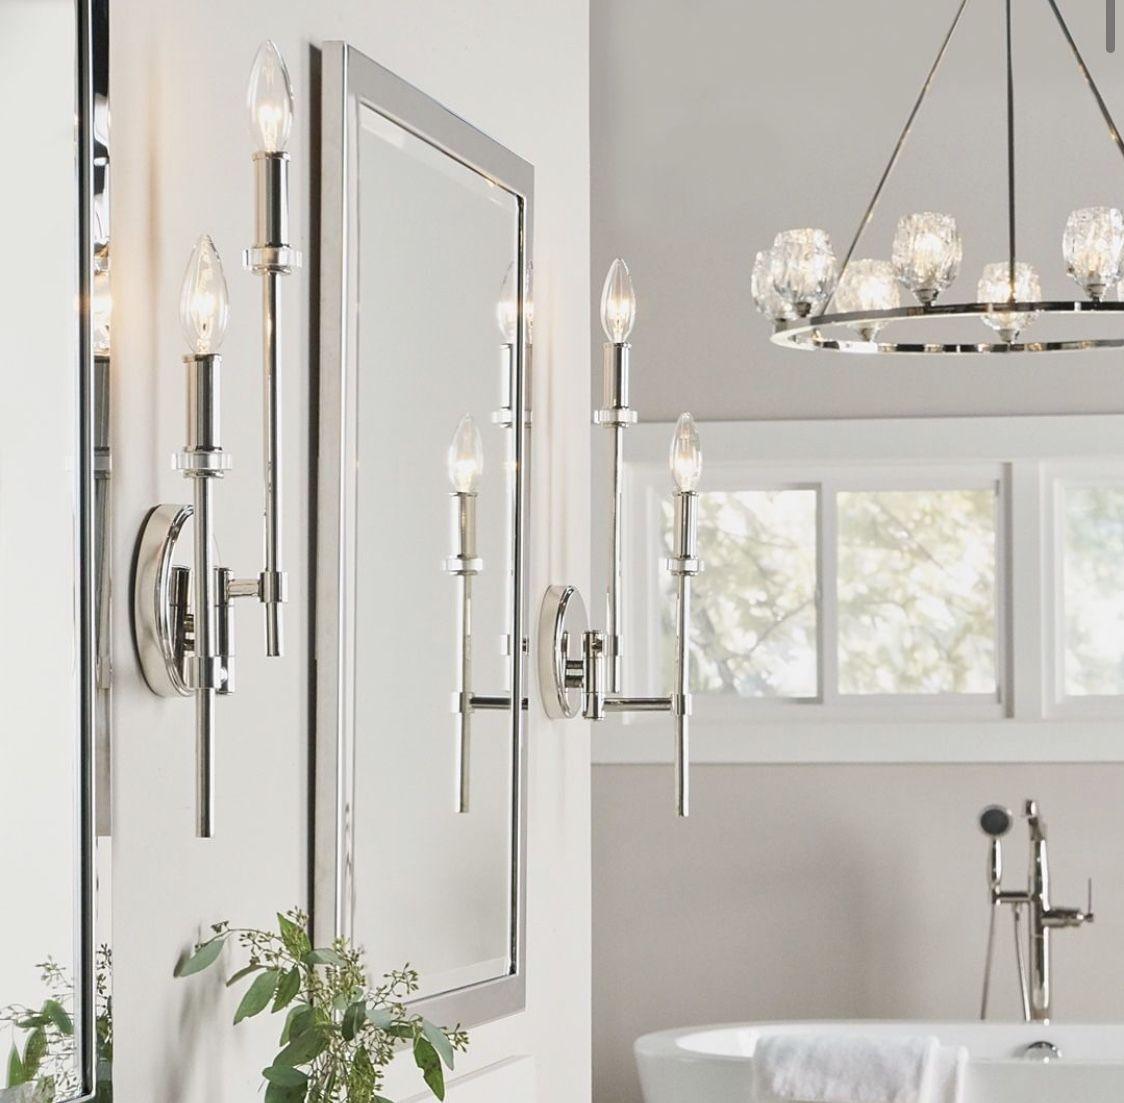 Classic Bathroom Classic Bathroom Elegant Bathroom Wall Sconce Lighting